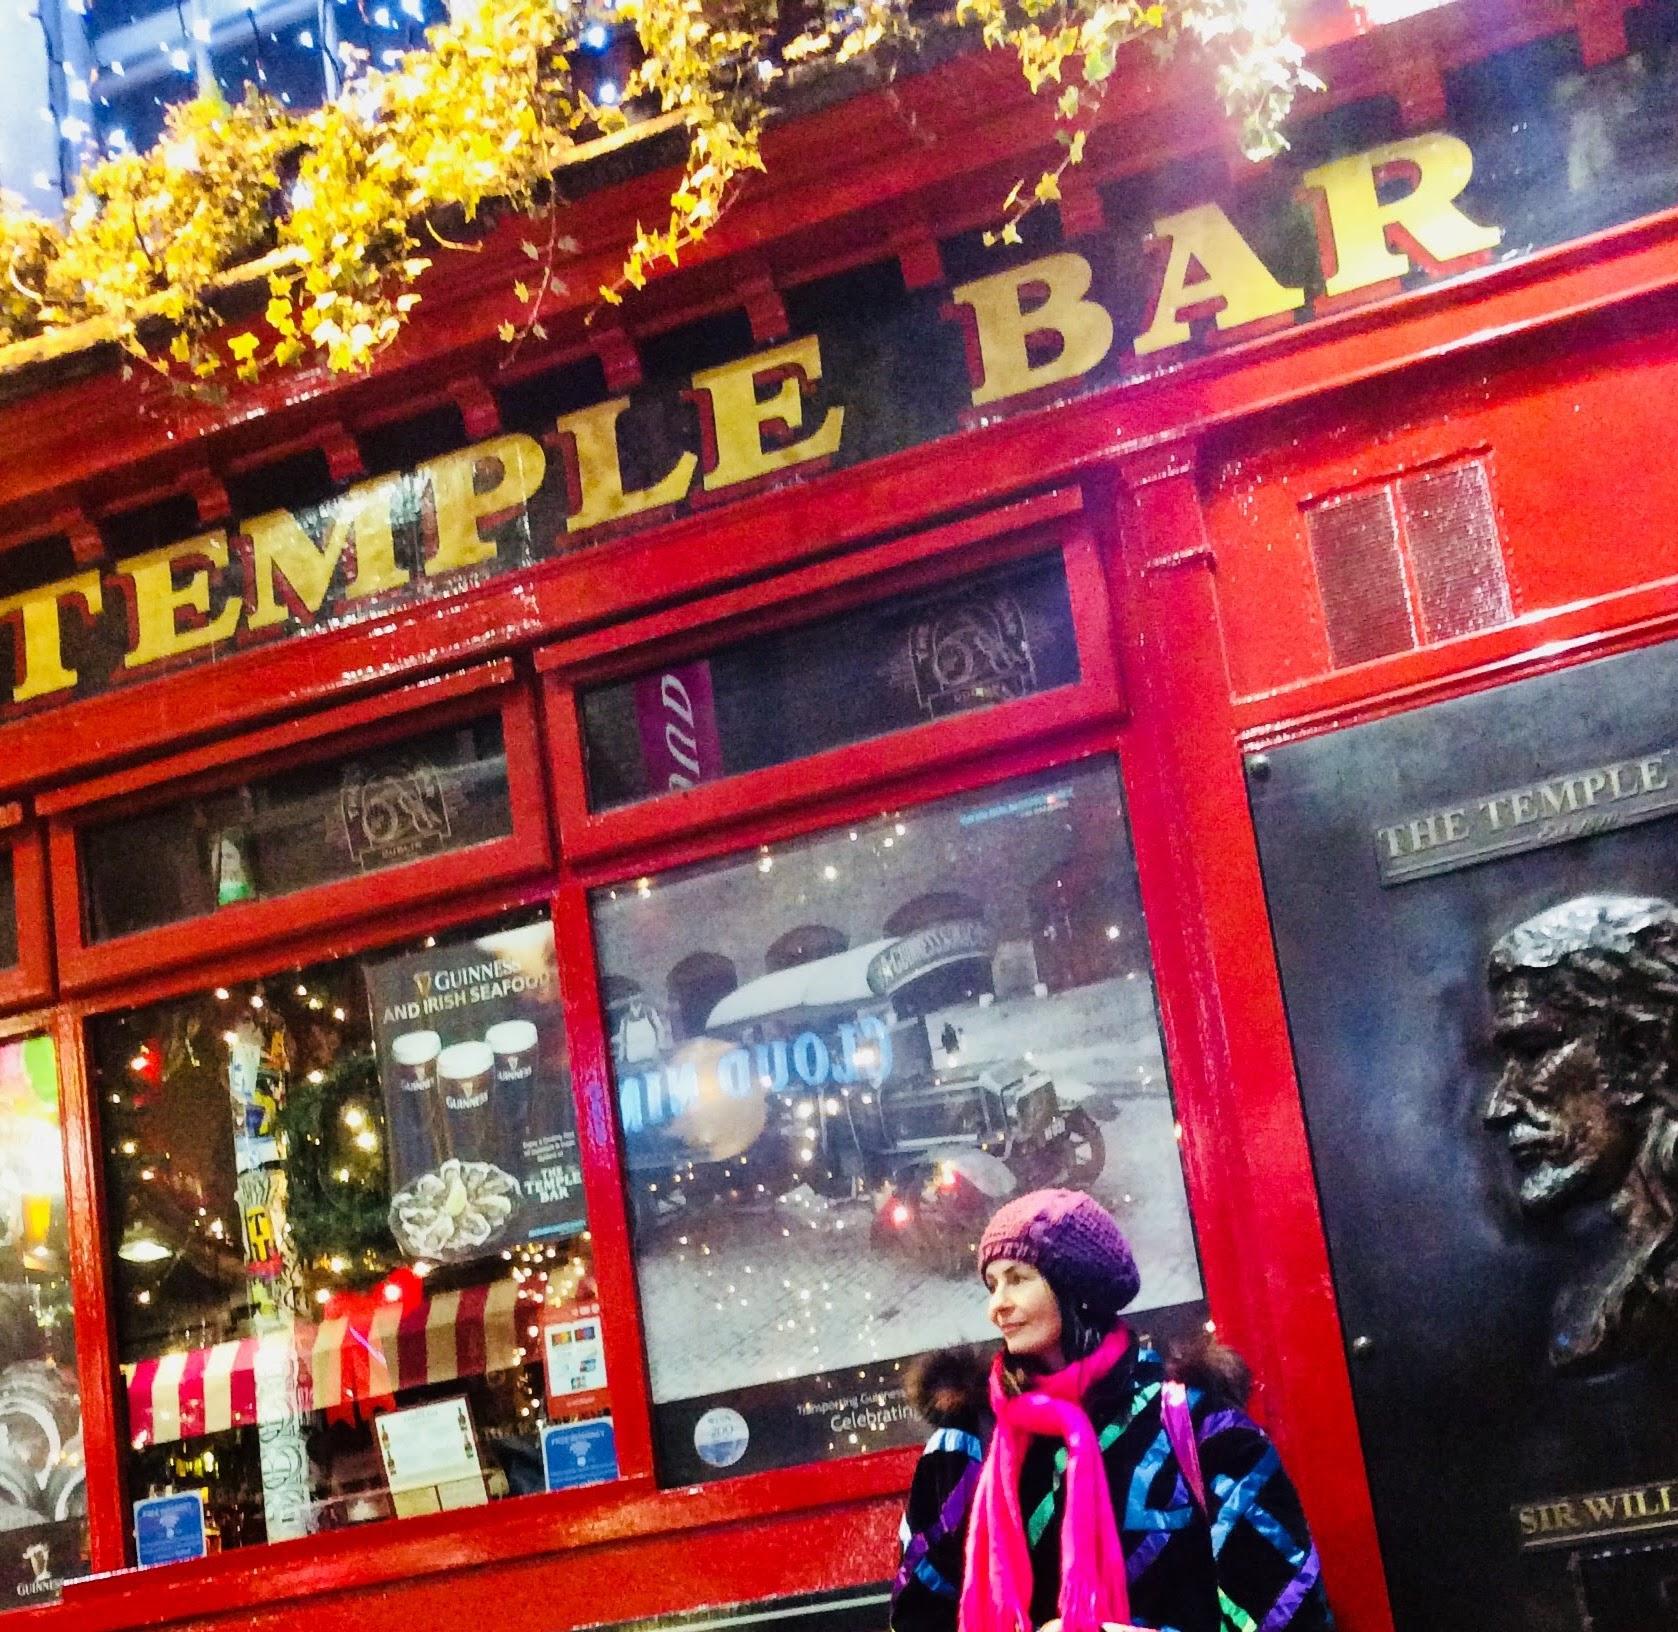 a rare tranquil moment down dublin's bohemian temple bar area. ootd a rare 80's vintage apres ski jacket.